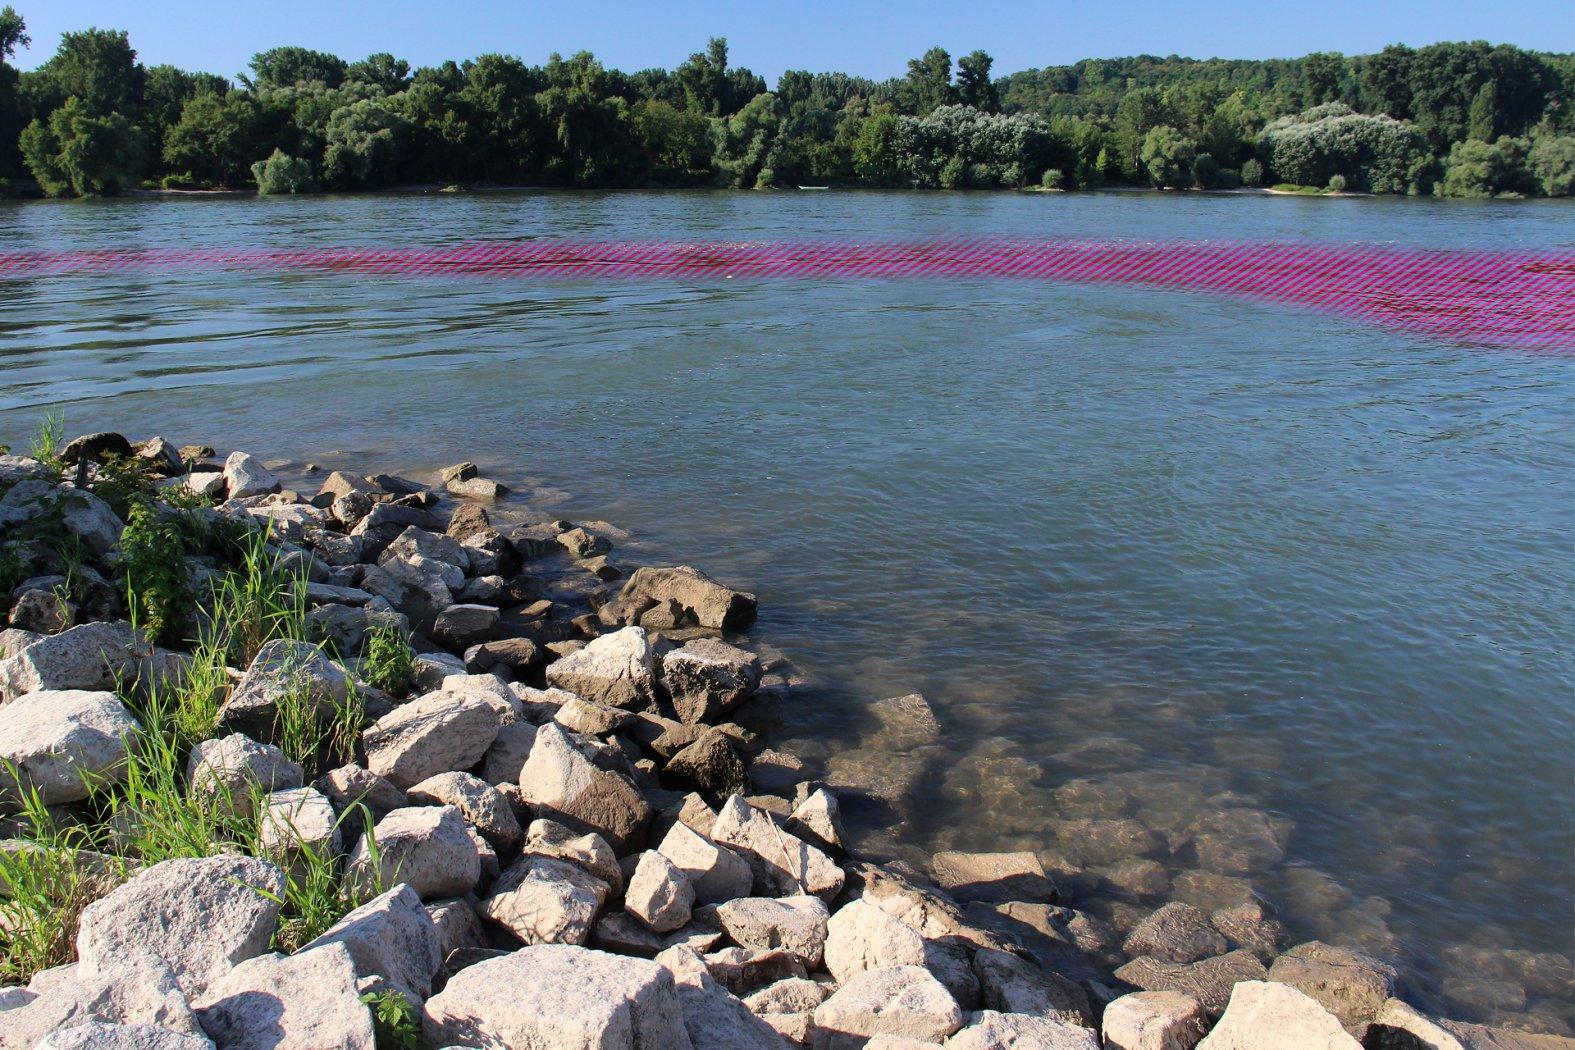 Barbenangeln im Fluss